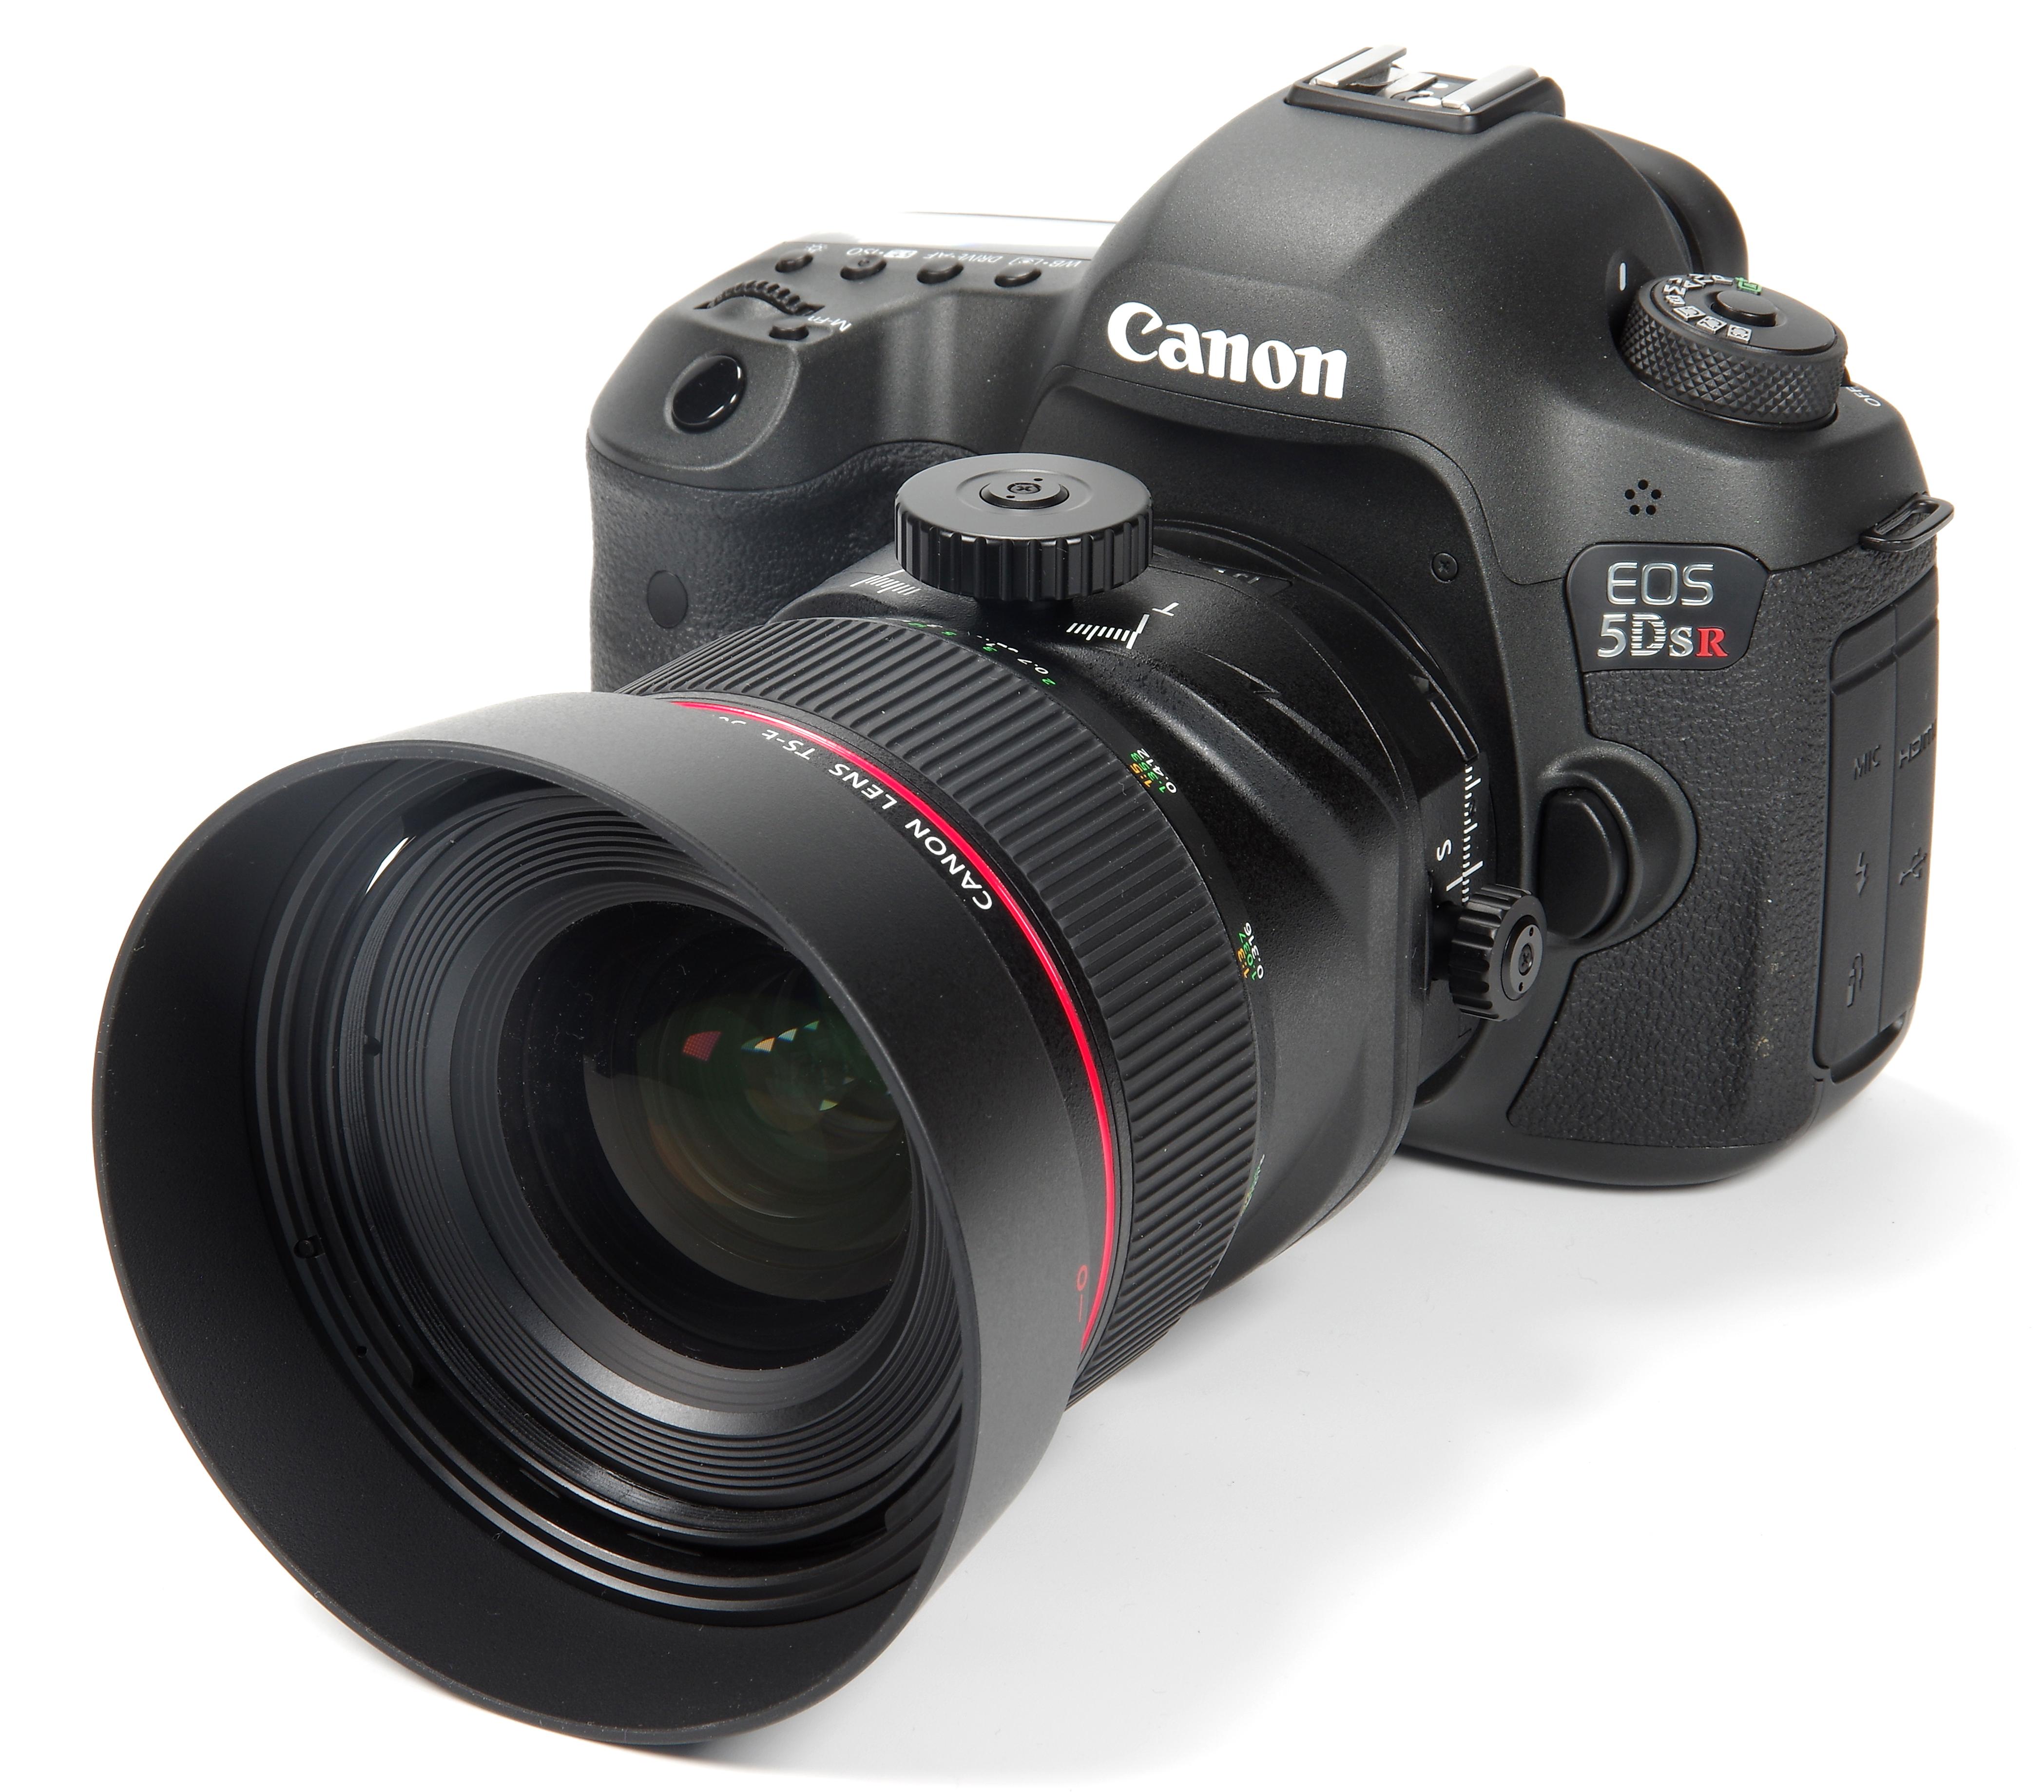 Canon TS-E 50mm f/2.8L Macro Review